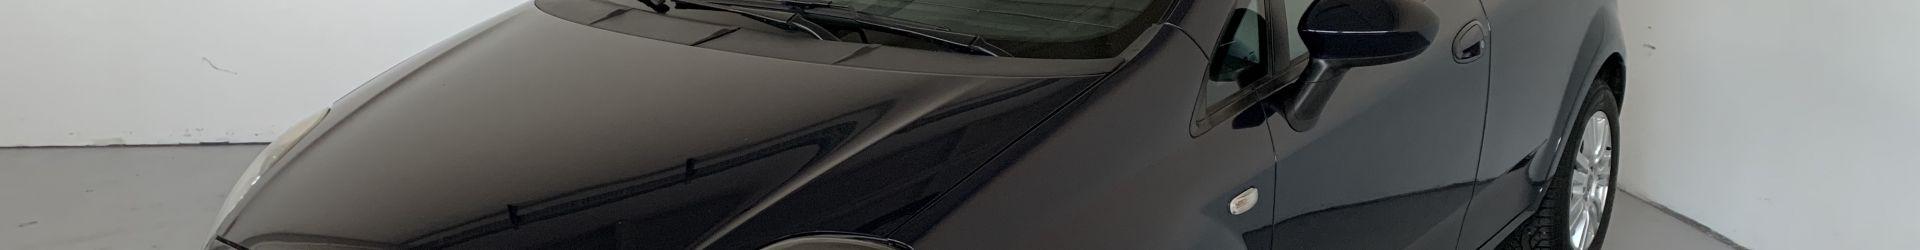 FIAT Grande Punto 1.4 easypower Easy Gpl 5p -IMPIANTO GPL ORIGINALE FIAT